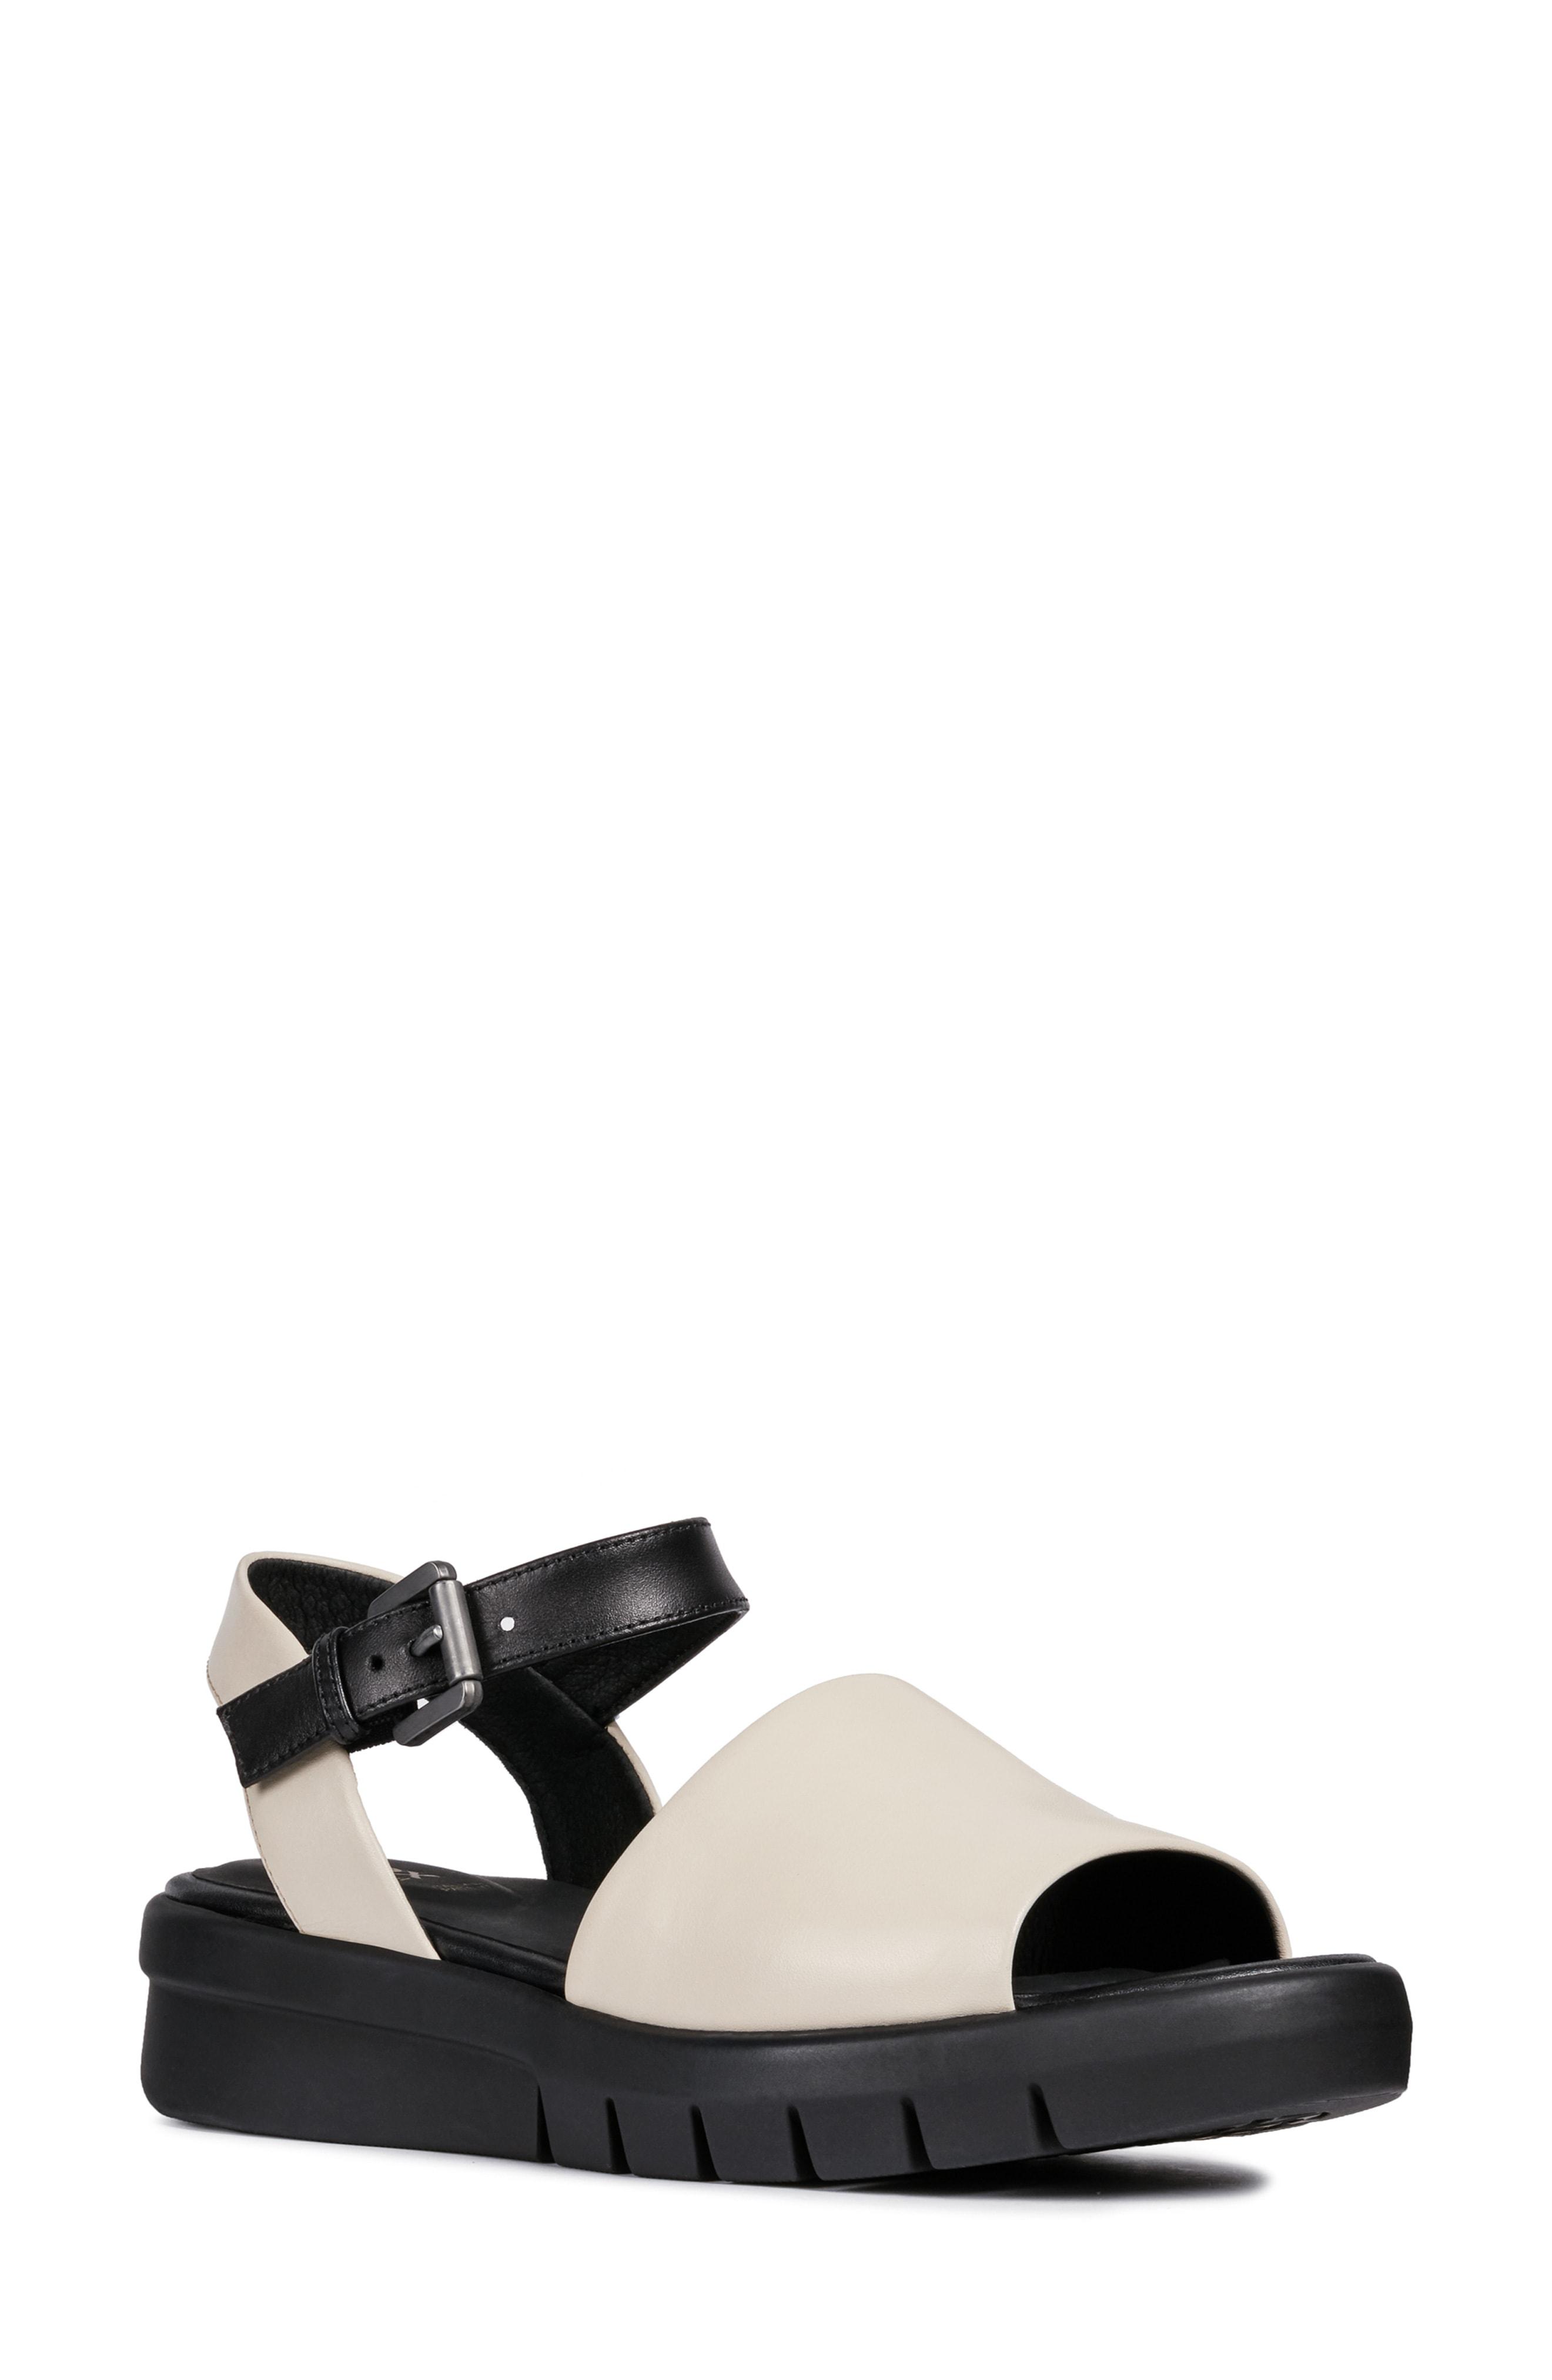 145d939b792 Geox Wimbley Platform Sandal In Black  Brown Faux Leather